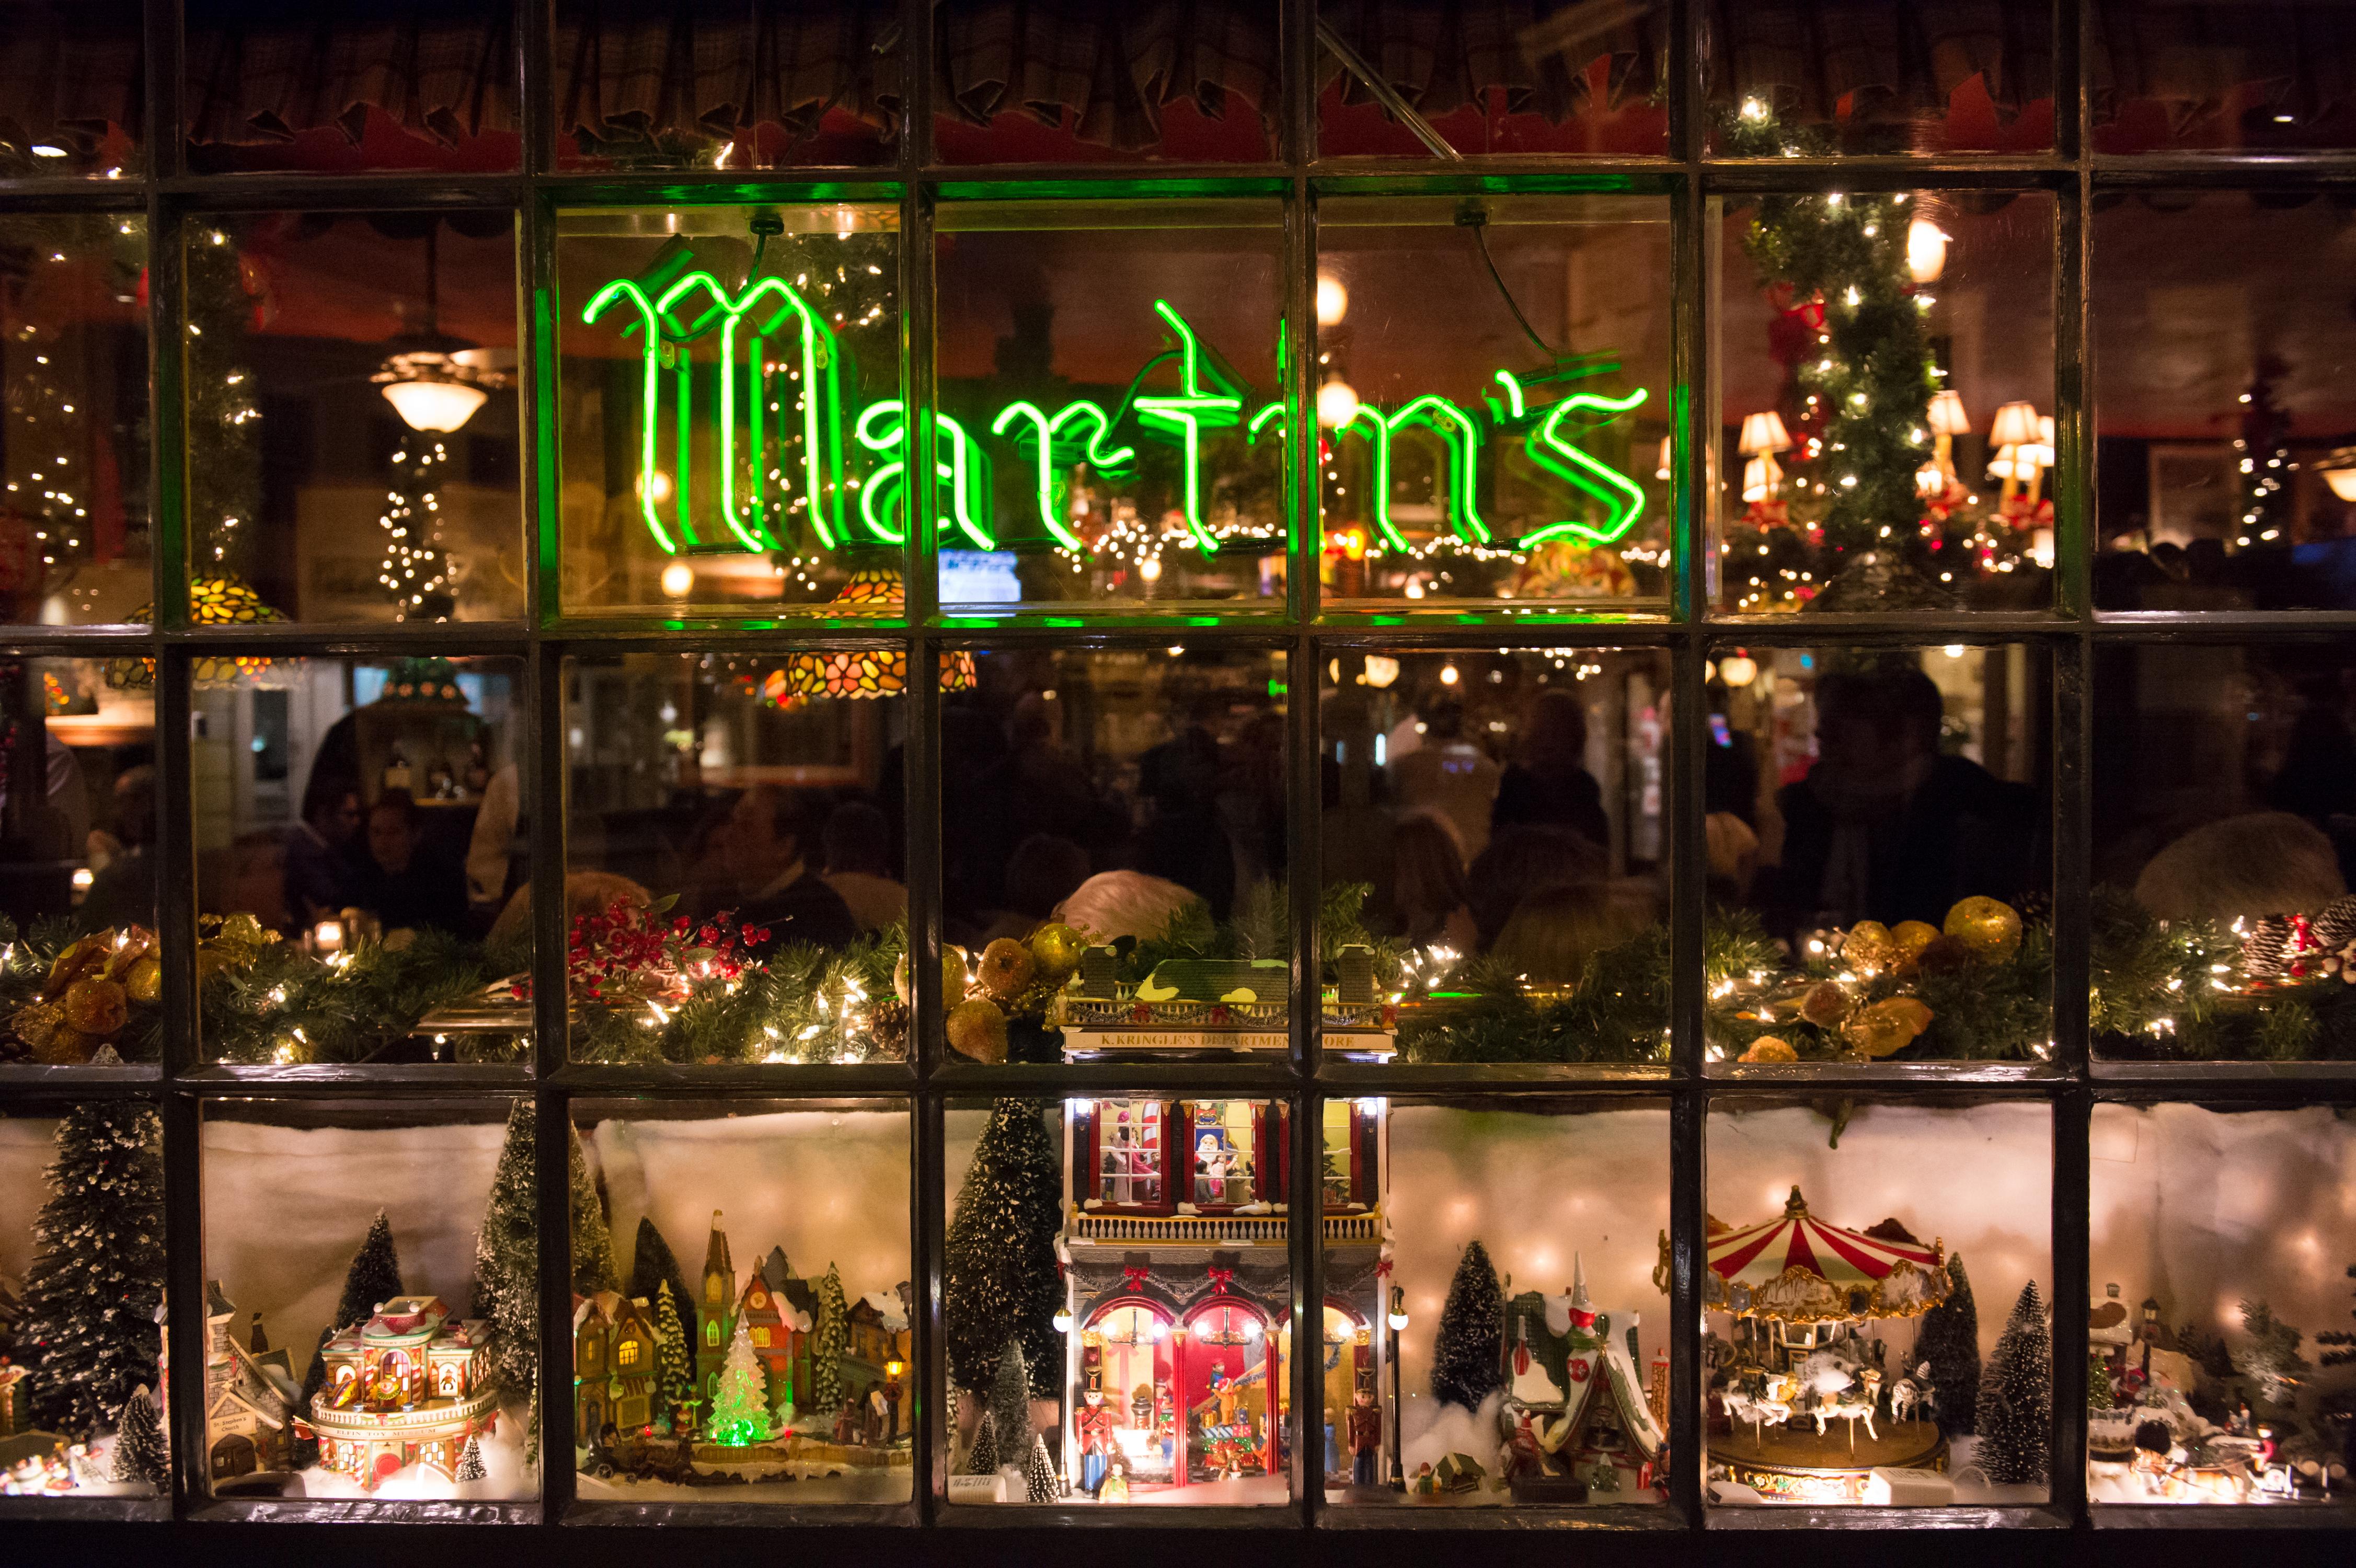 WASHINGTON, DC - NOVEMBER 21: Martin's Tavern is a local Georg